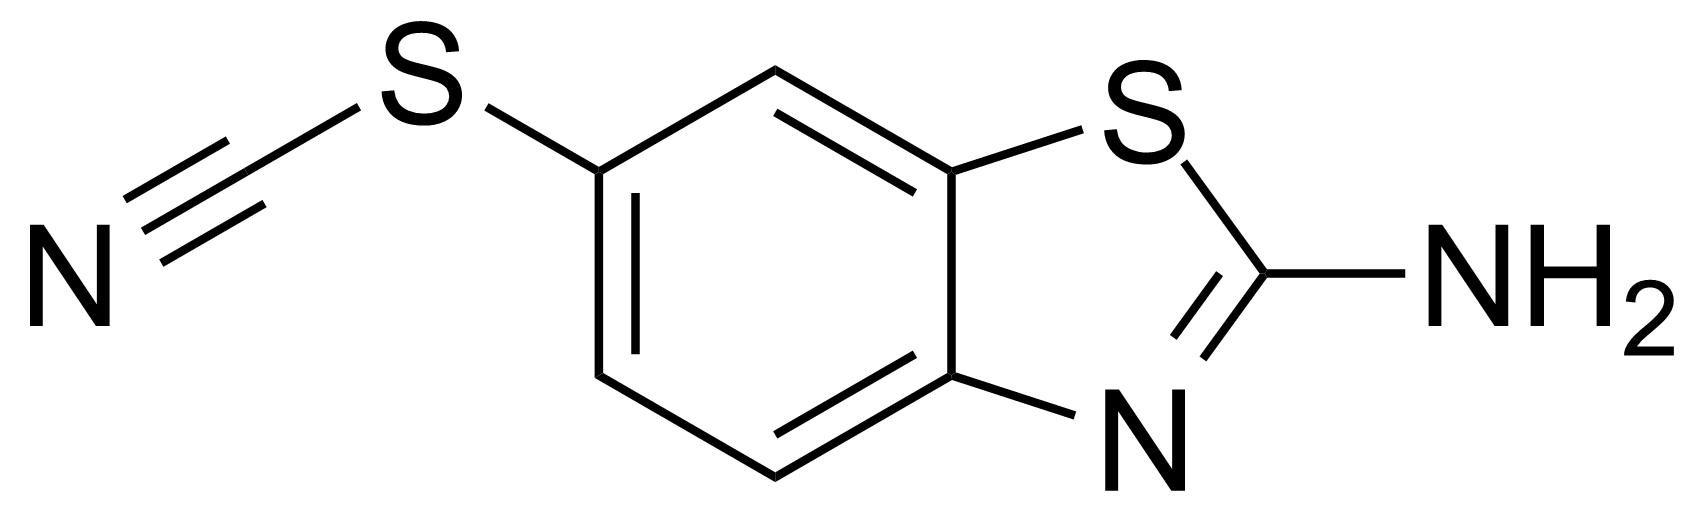 Structure of 2-Amino-6-thiocyanatobenzothiazole